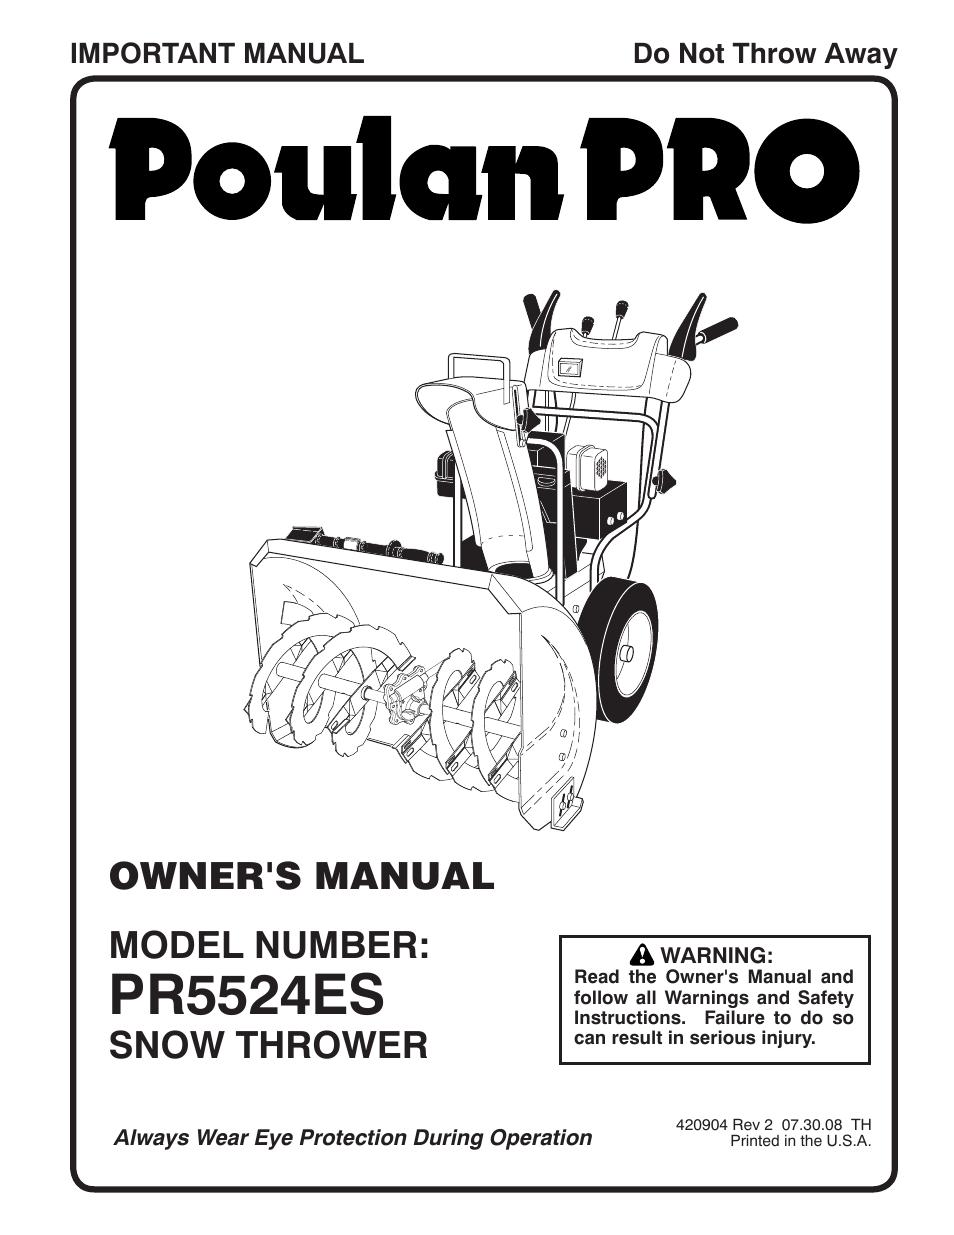 Craftsman Snowblower Owners Manual Online